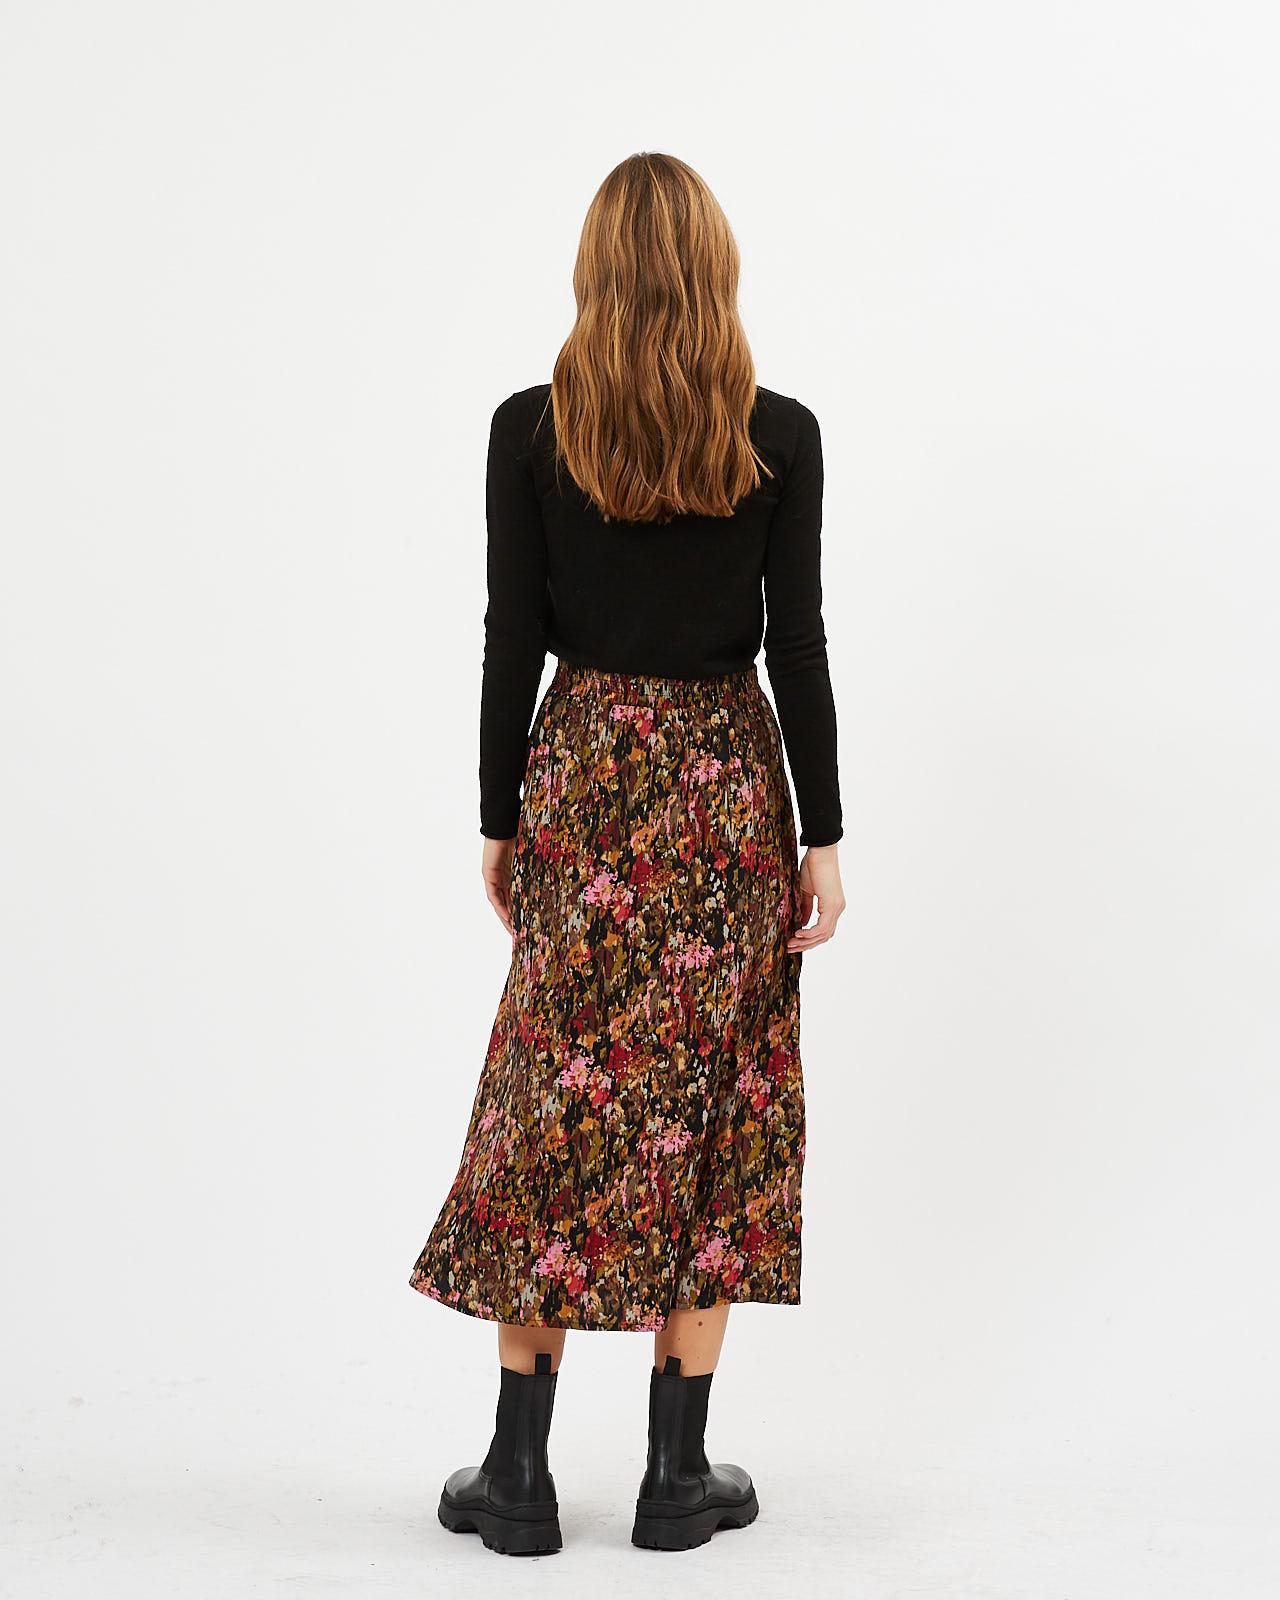 Tonjelina Skirt